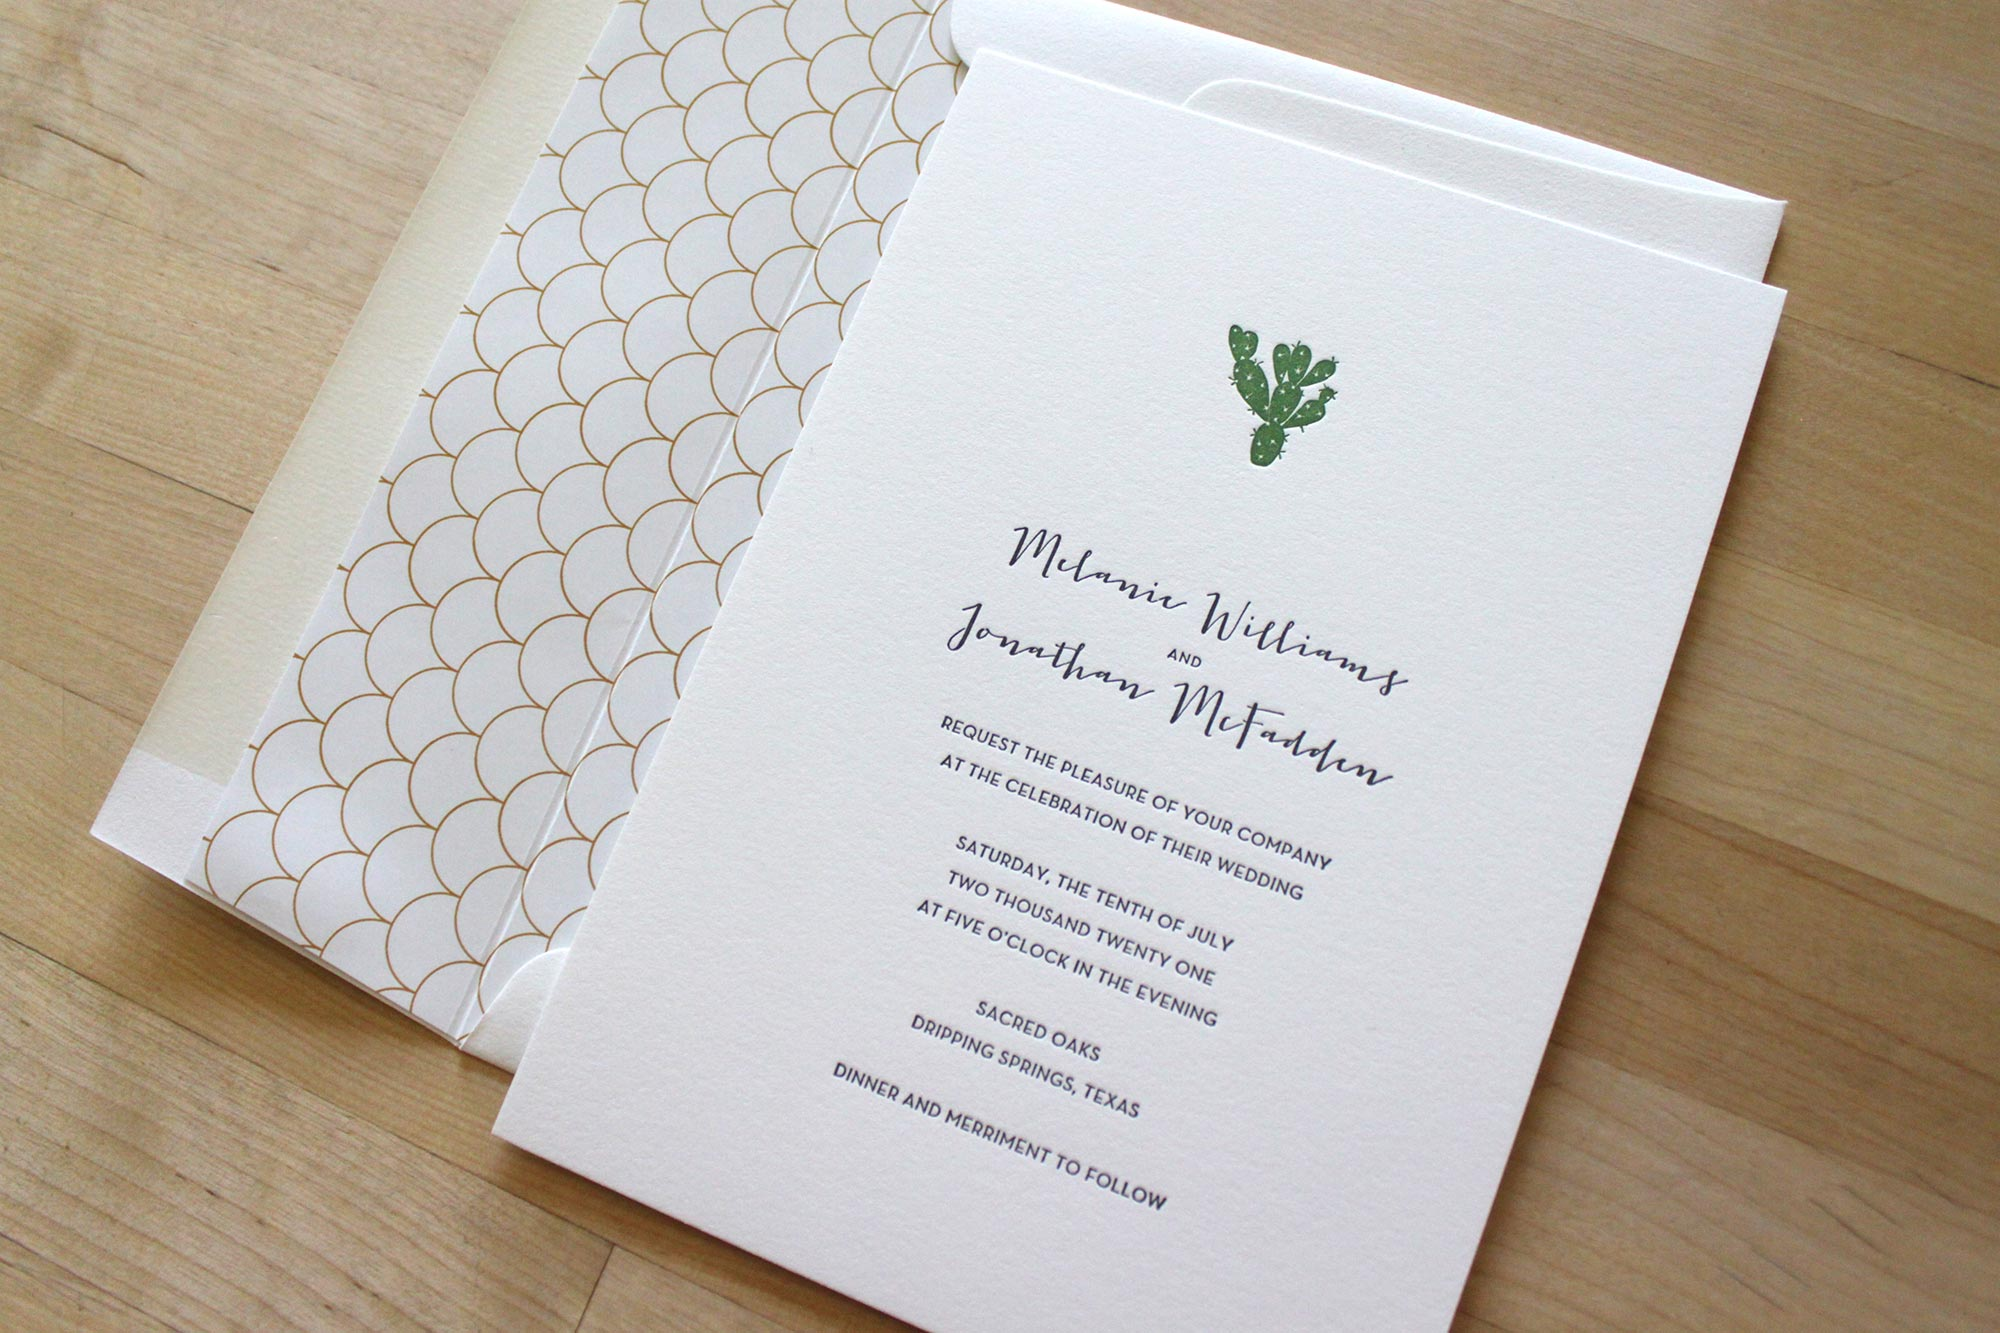 Cactus-Liner-letterpress-wedding-invitations.jpg